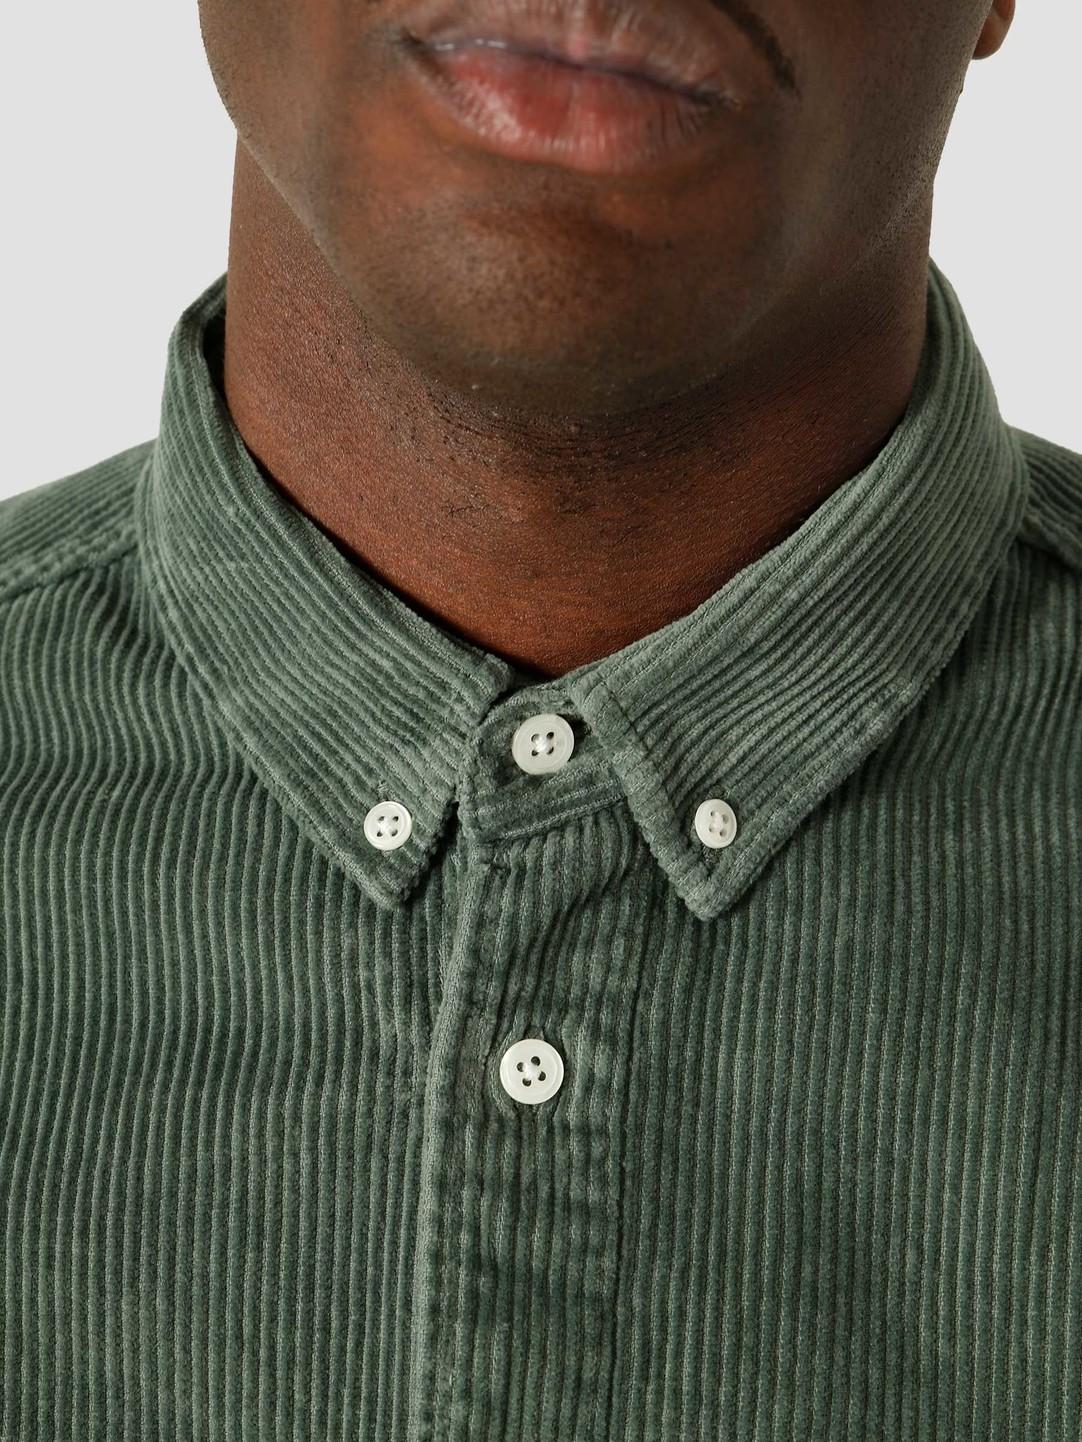 Quality Blanks Quality Blanks QB41 Cord Shirt Olive Green